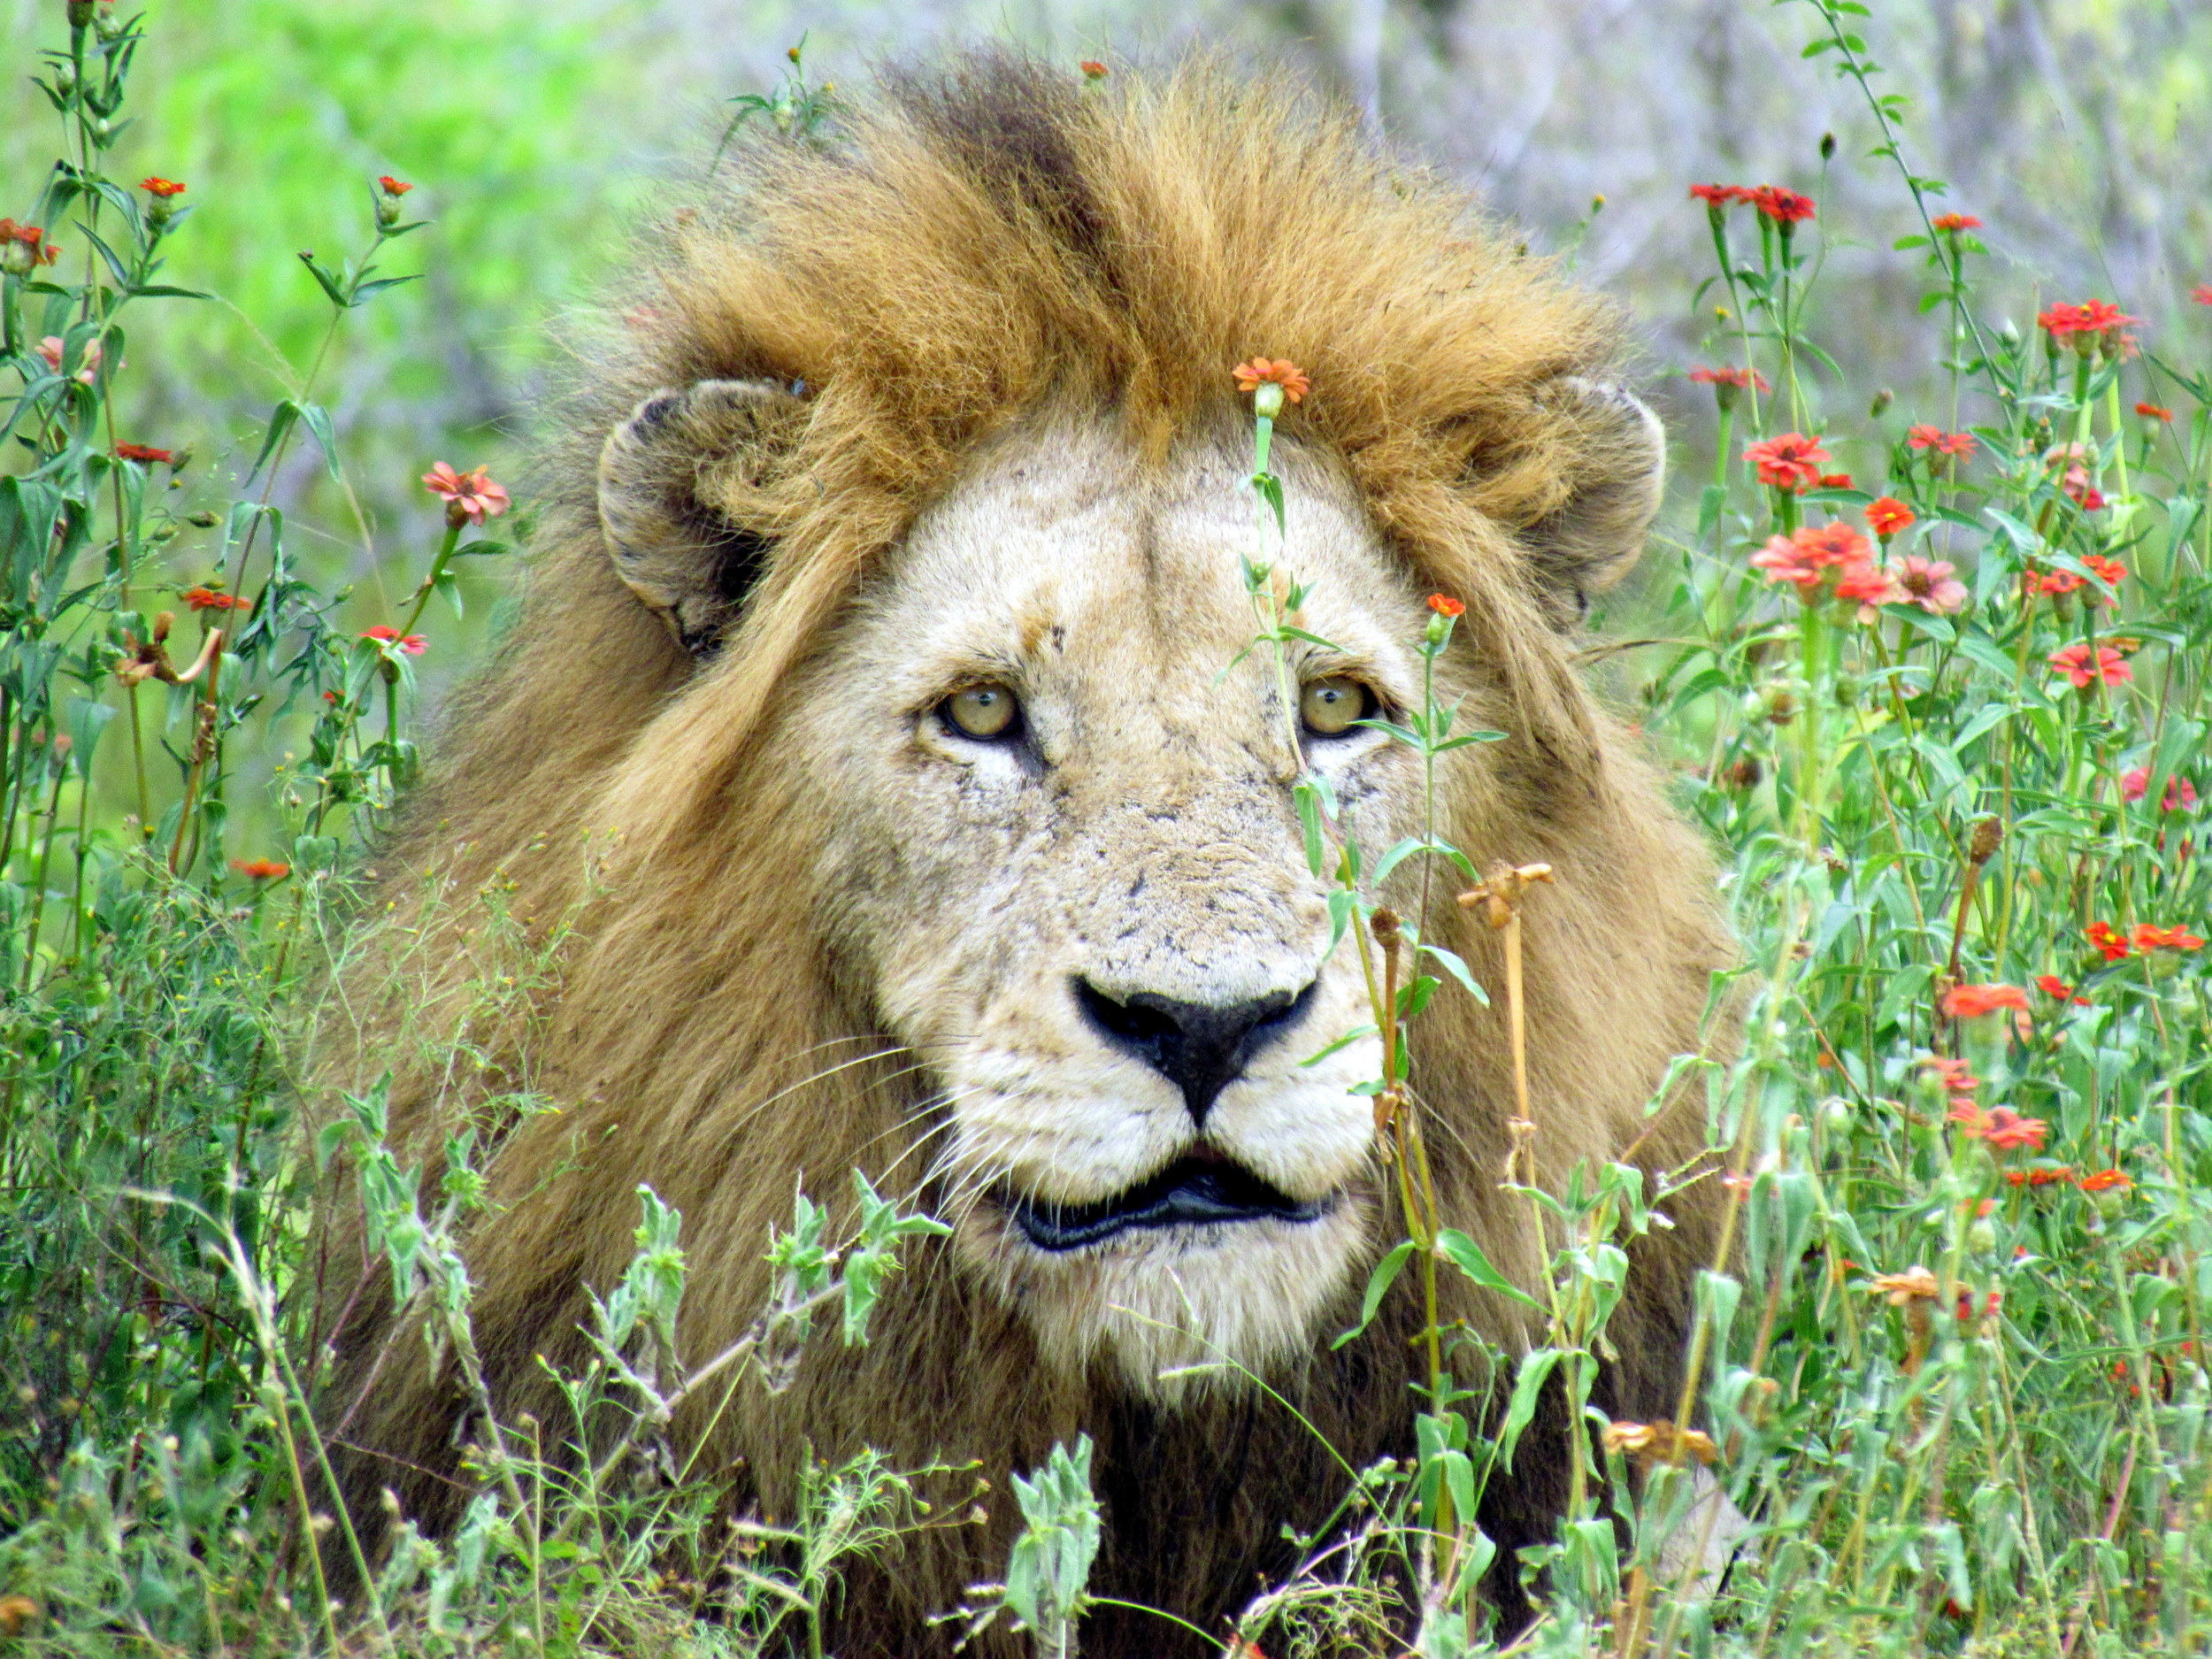 Lion - South Africa Safari - Djuma Game Reserve - Sabi Sand - Kruger National Park   Photo credit: David Berkowitz